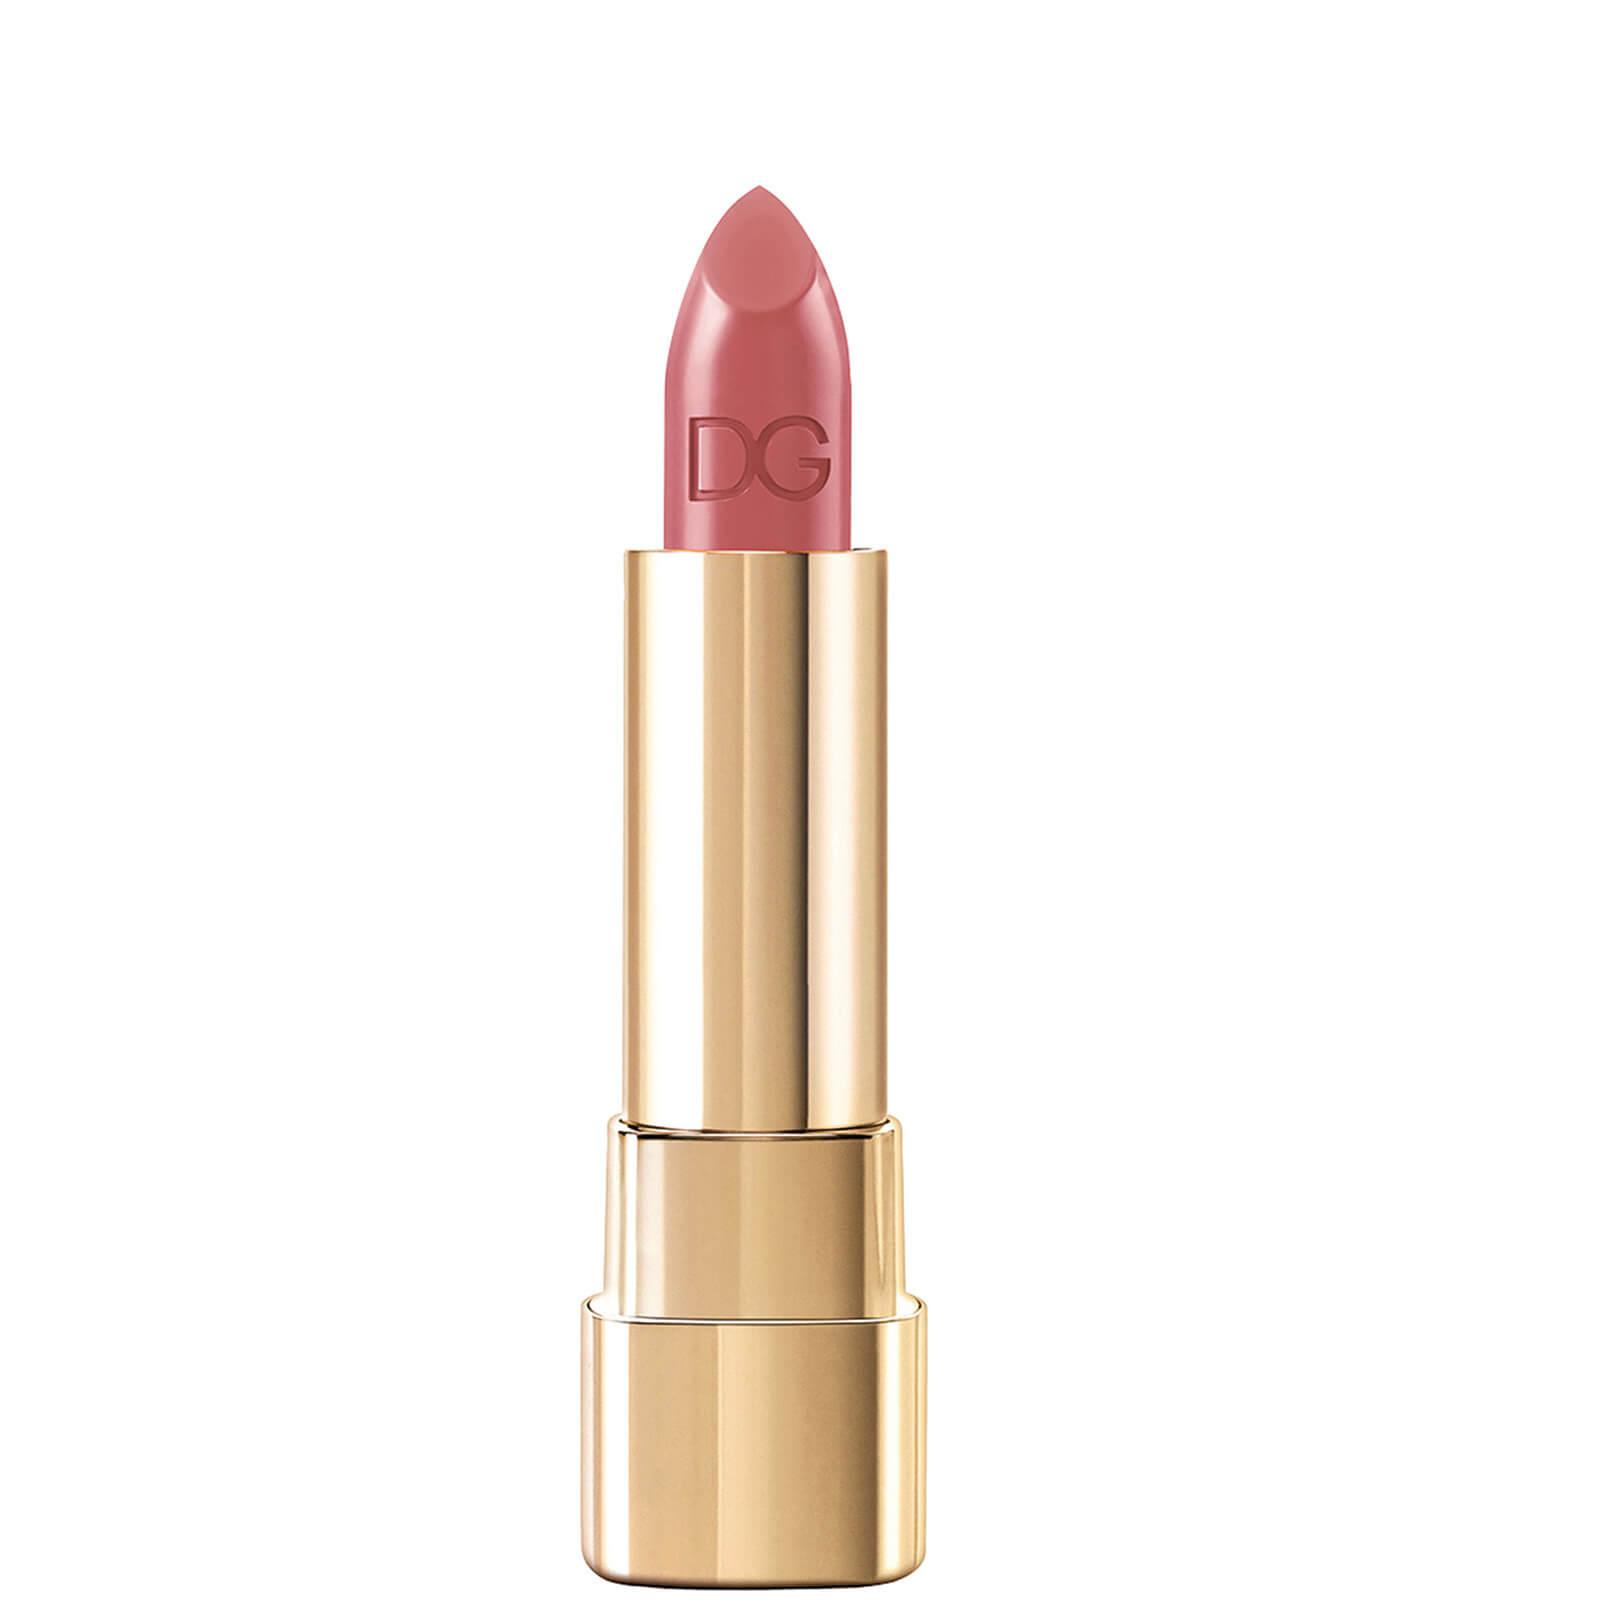 Dolce&Gabbana Classic Cream Lipstick 3.5g (Various Shades) - 235 Charm